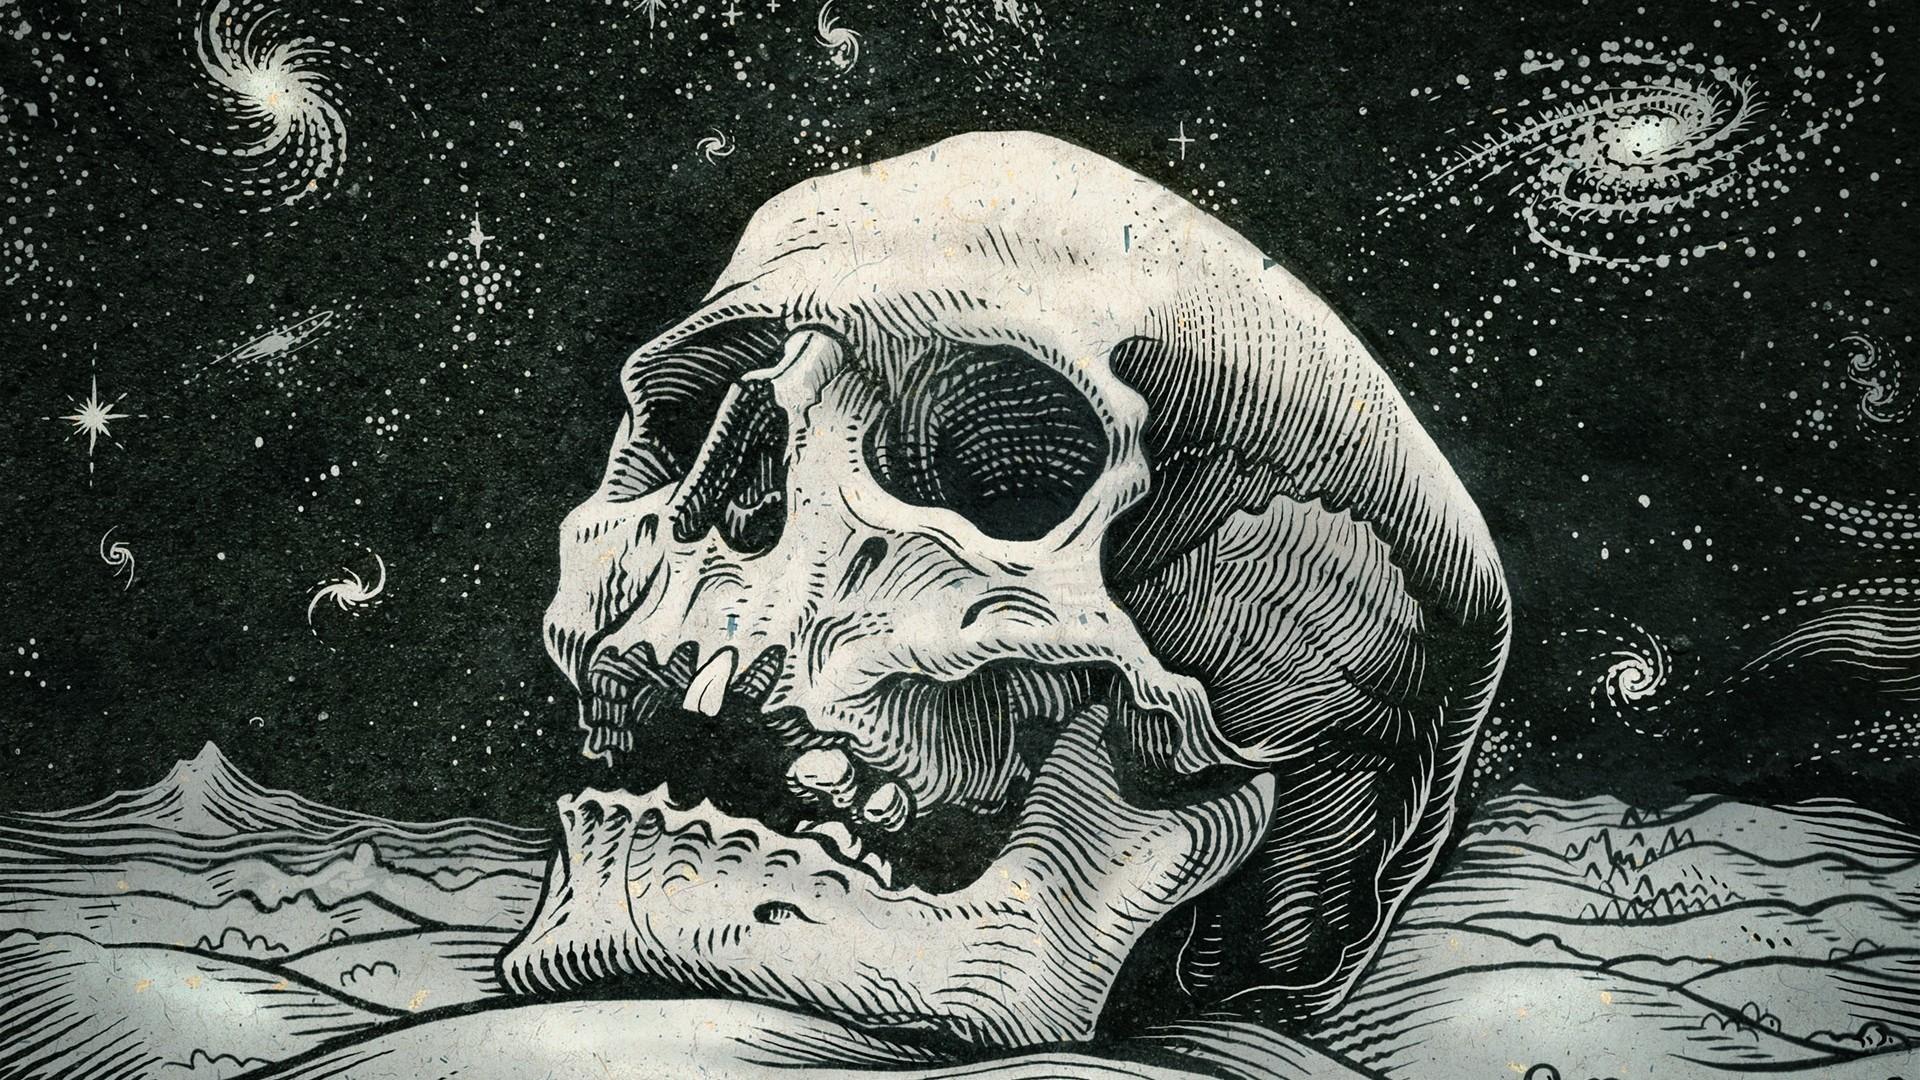 Cool Wallpaper of Skull | HD Wallpapers | Pinterest | Skull wallpaper, Hd  skull wallpapers and Wallpaper